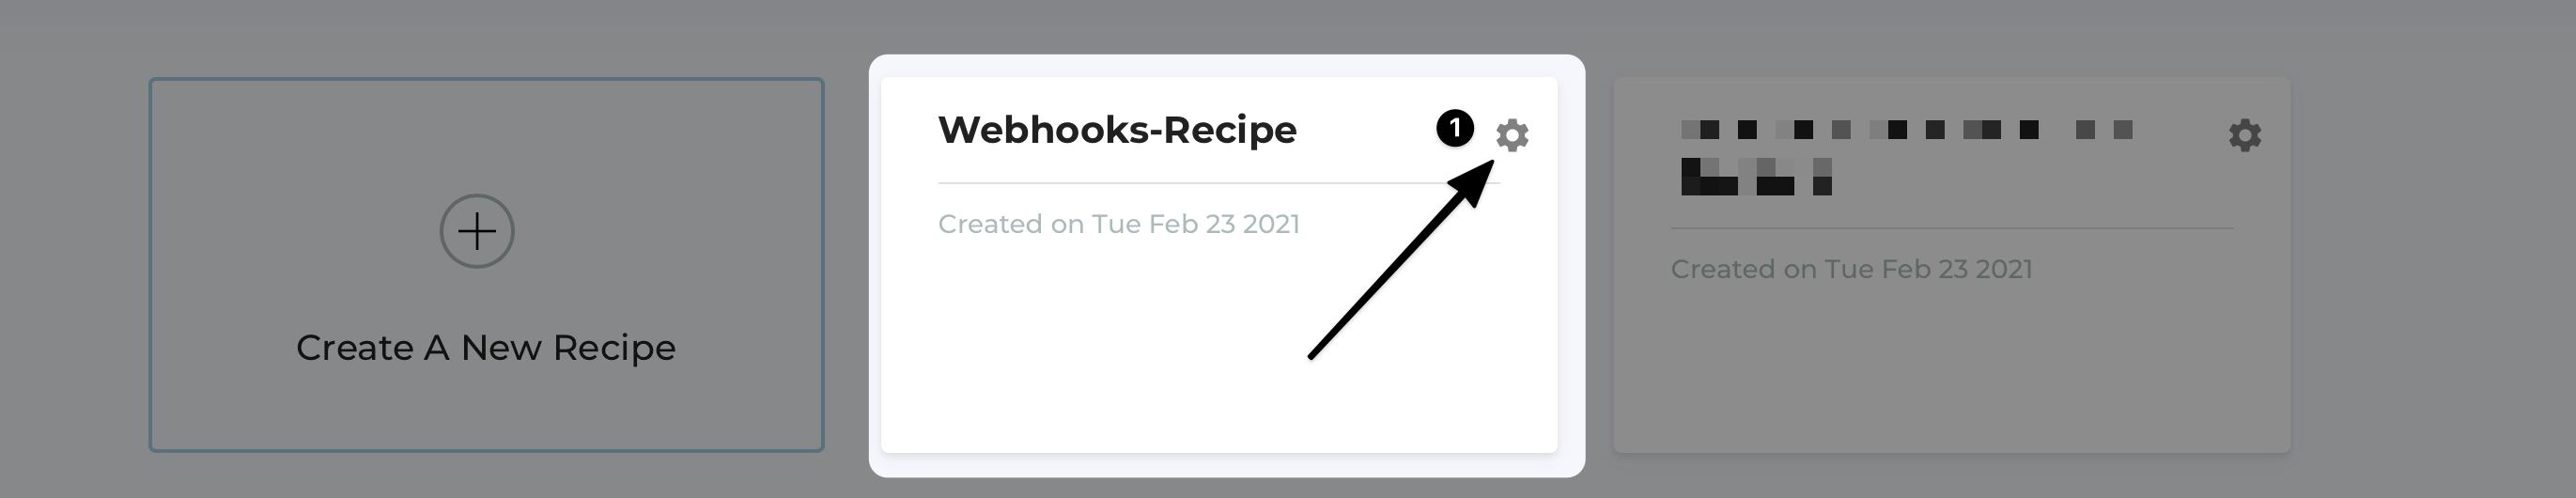 Select Recipe to Setup Webhooks